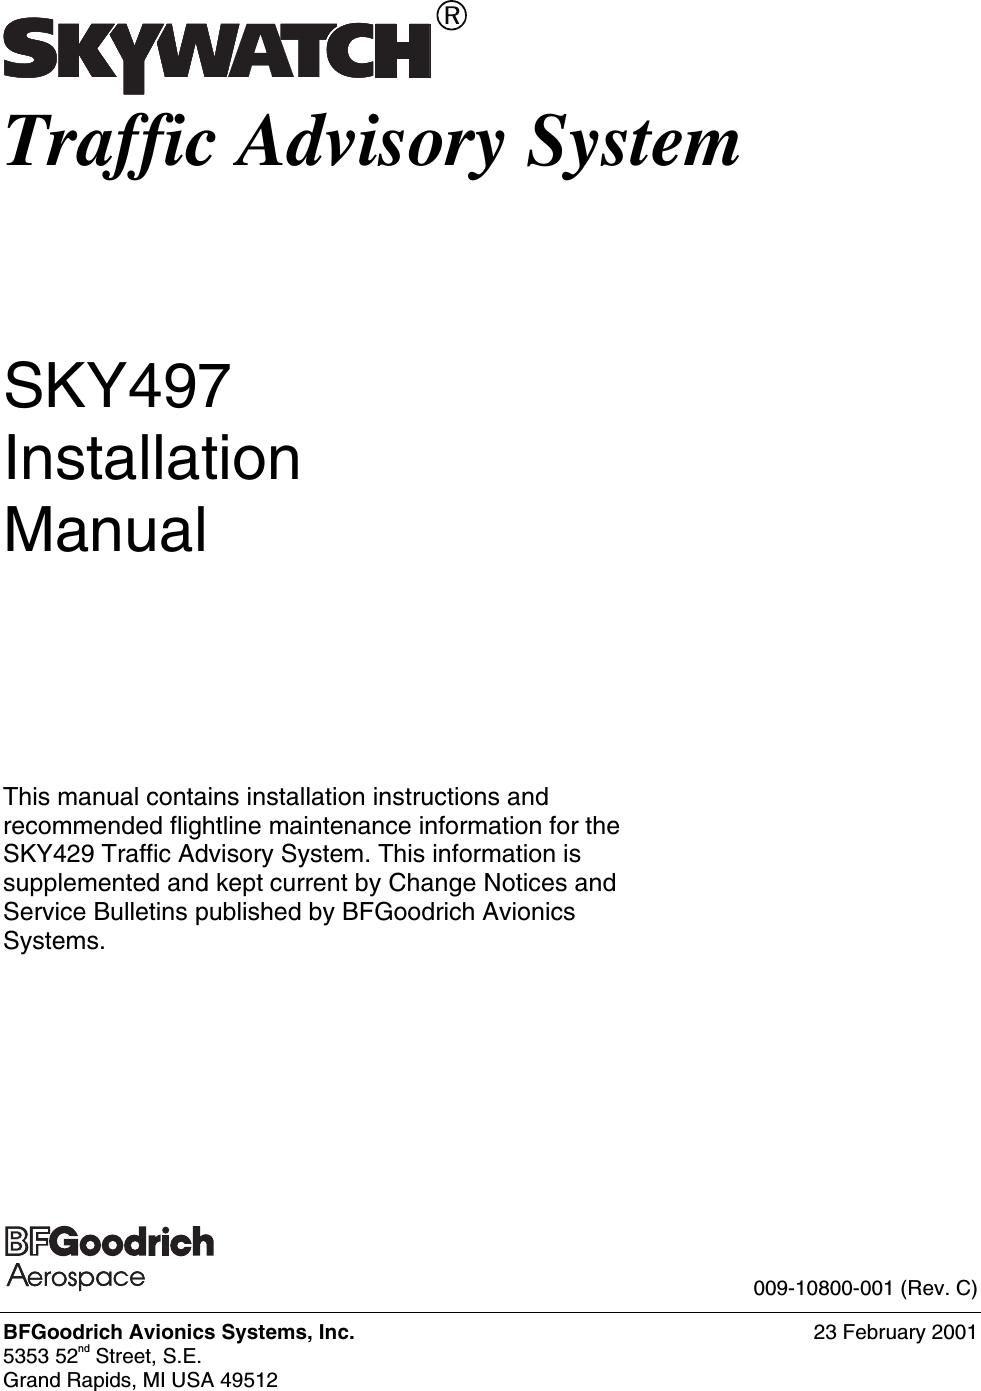 l 3 communications avionics systems trc497 skywatch traffic advisory rh usermanual wiki Instruction Manual Book Wildgame Innovations Manuals